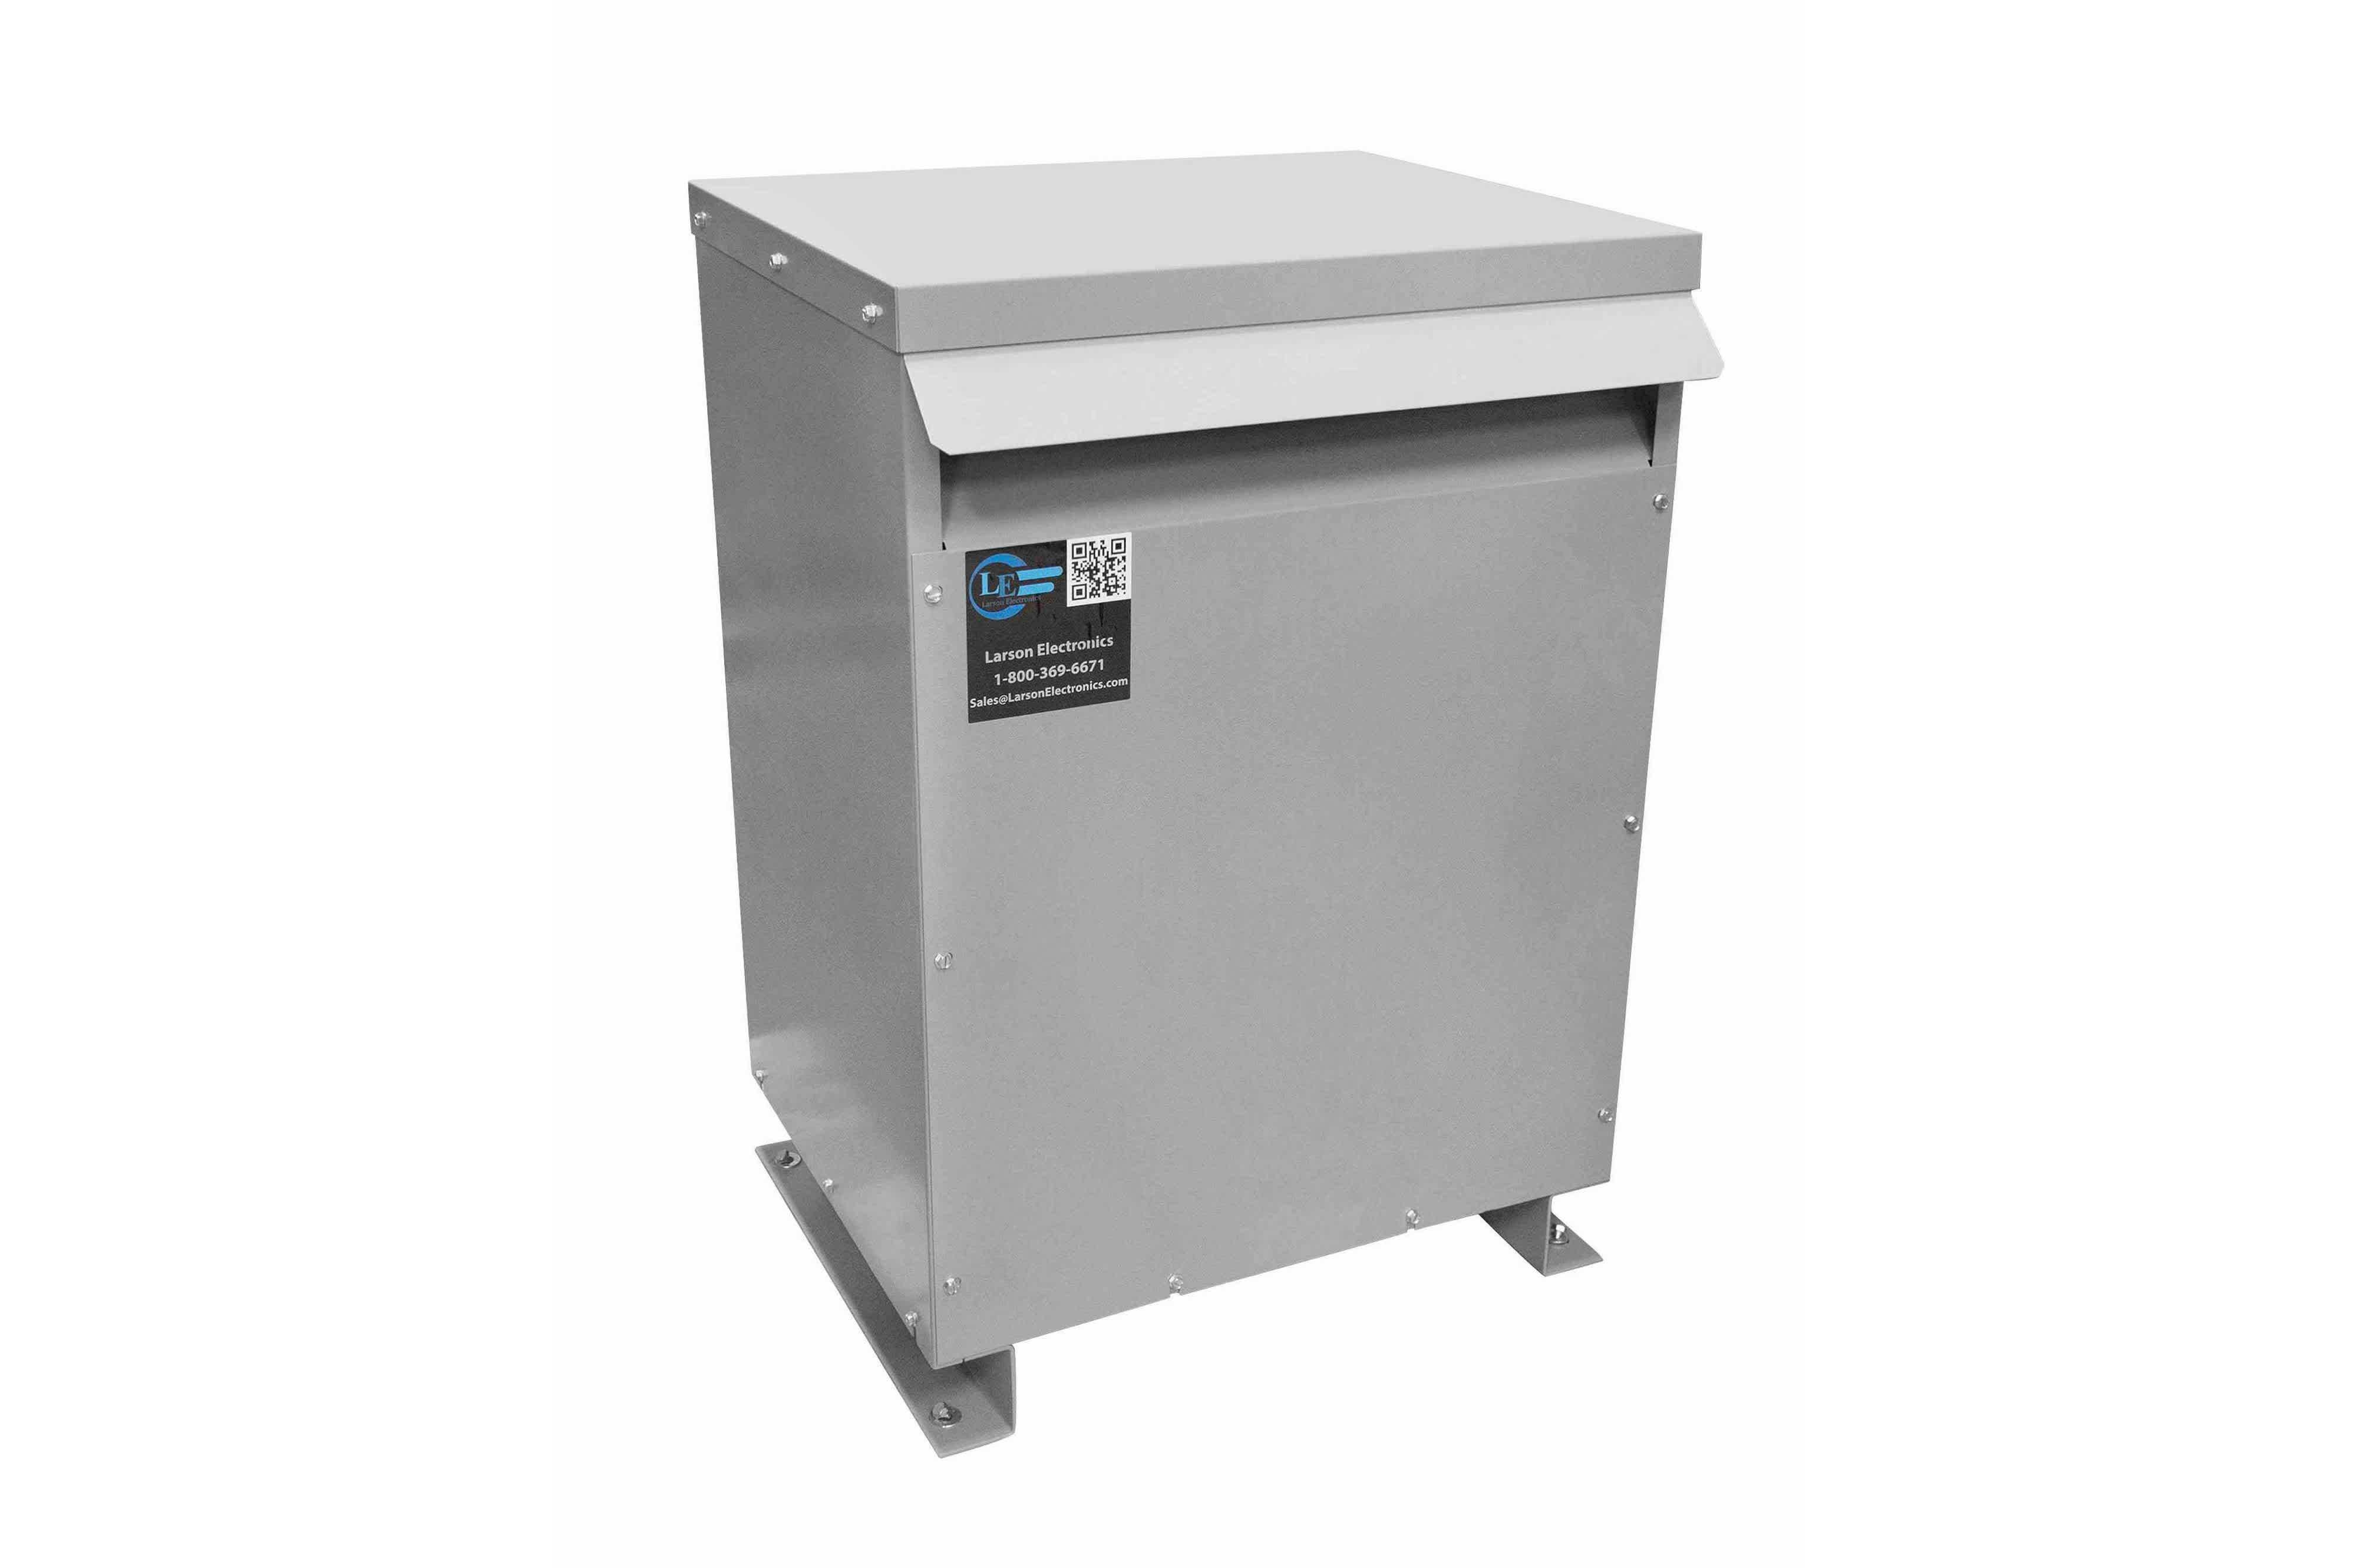 75 kVA 3PH Isolation Transformer, 600V Wye Primary, 460V Delta Secondary, N3R, Ventilated, 60 Hz